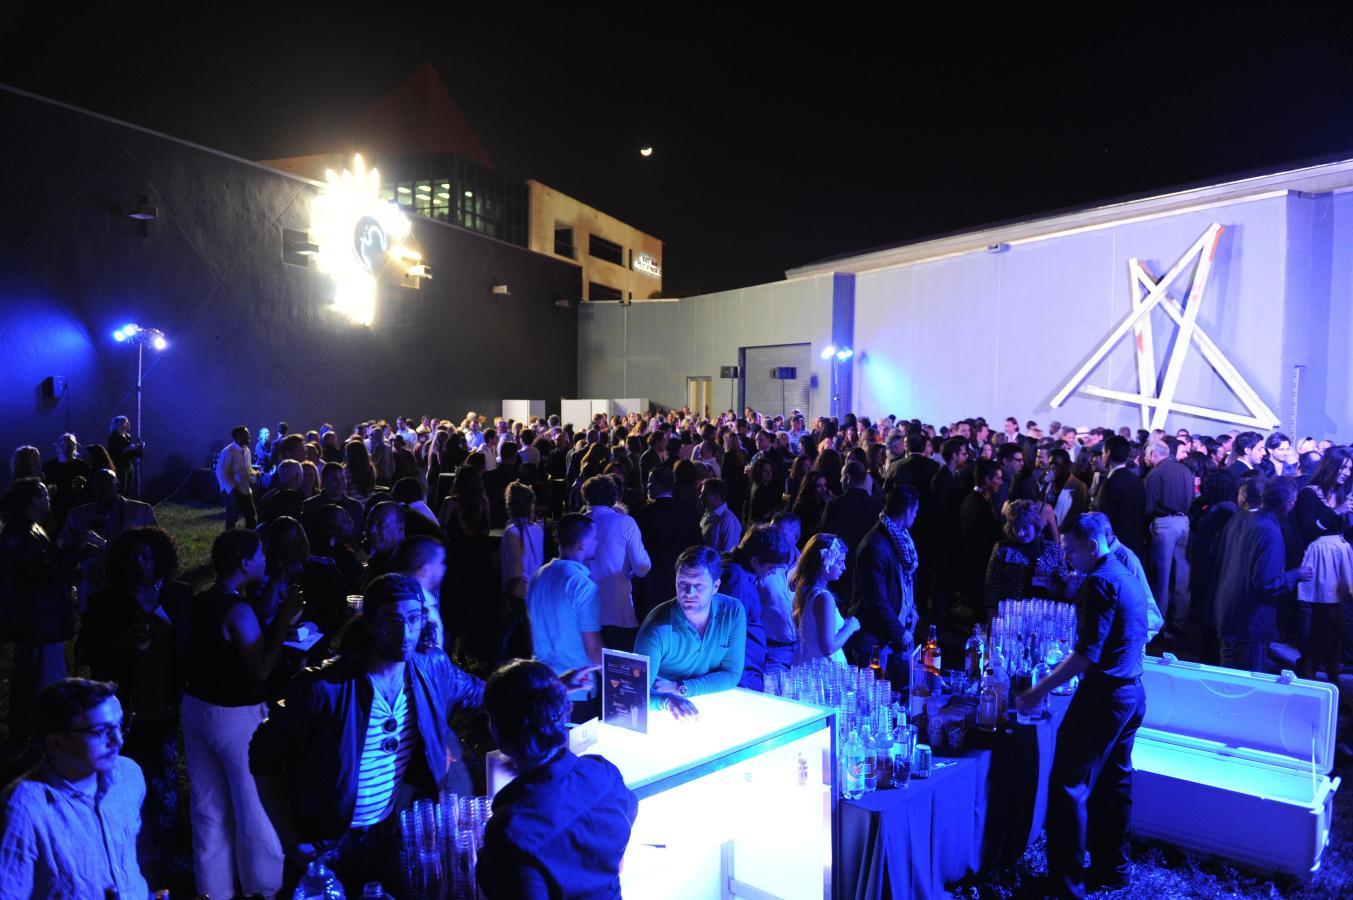 MOCA Opening Reception of Mark Handforth: Rolling Stop